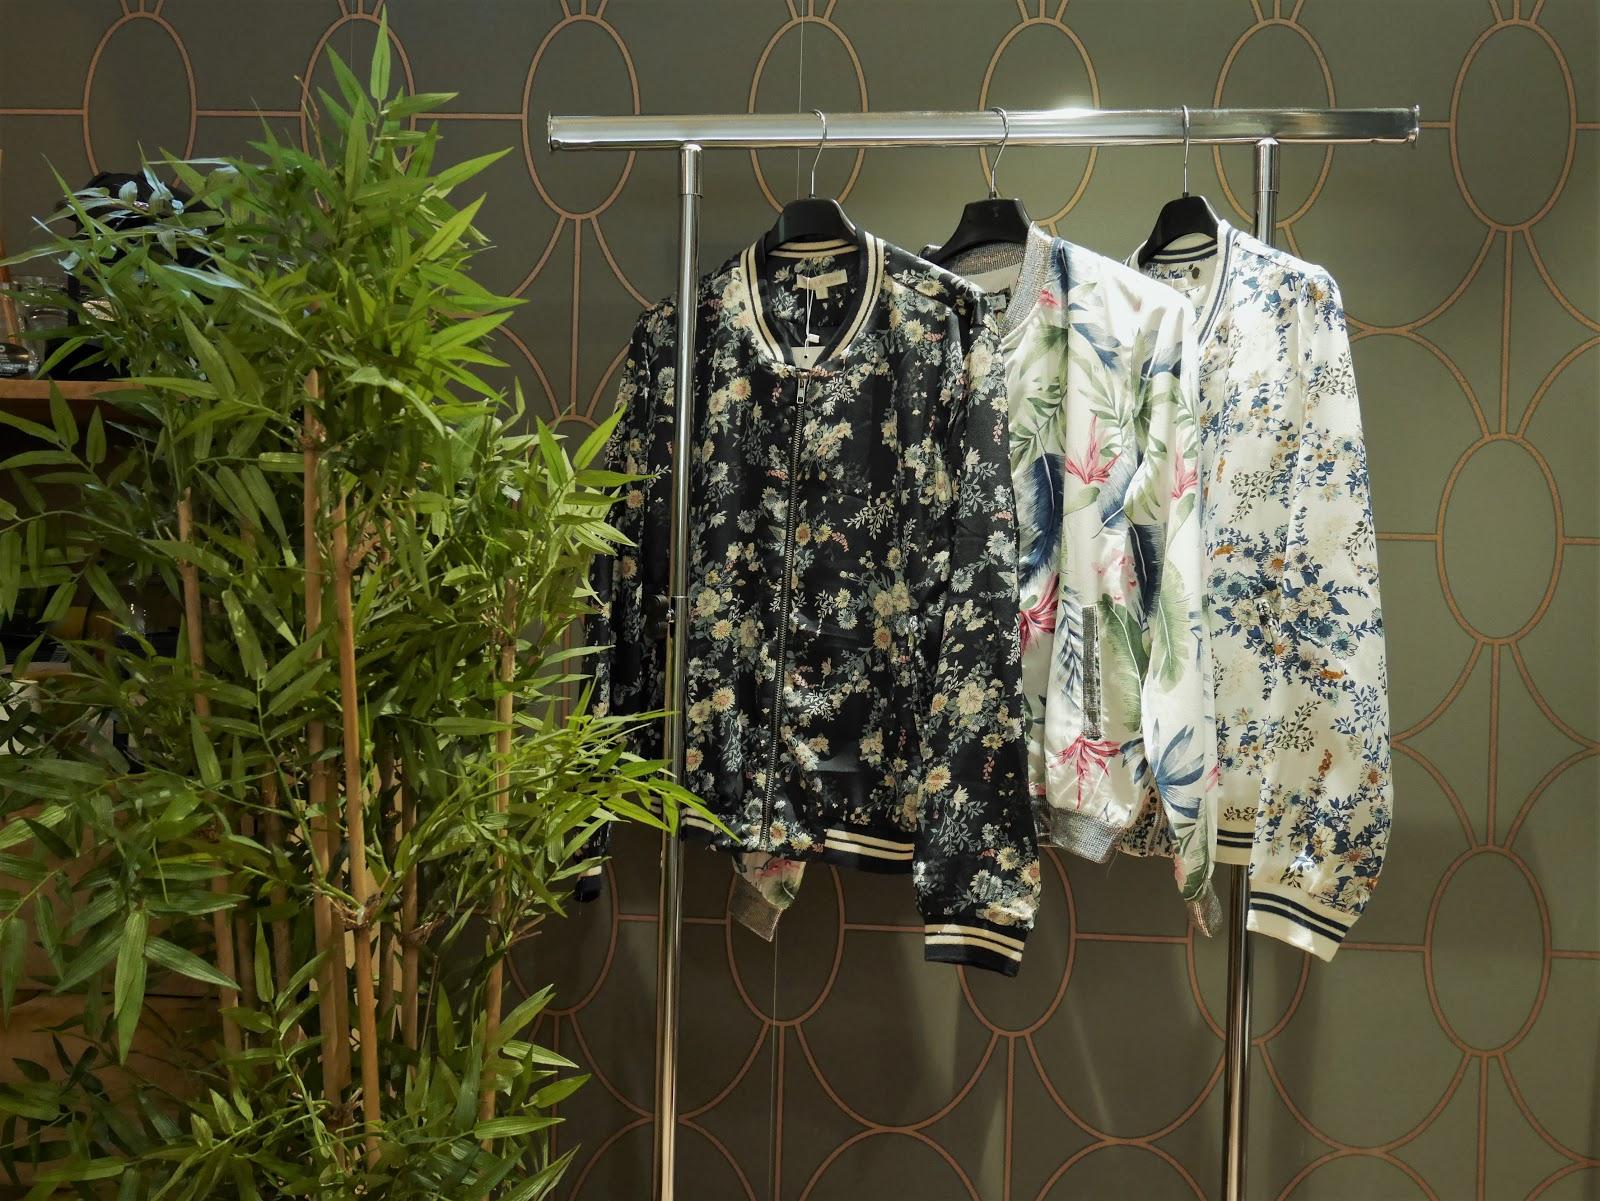 twinz-boutique-pret-a-porter-antony-veste-danslaruedacote.fr